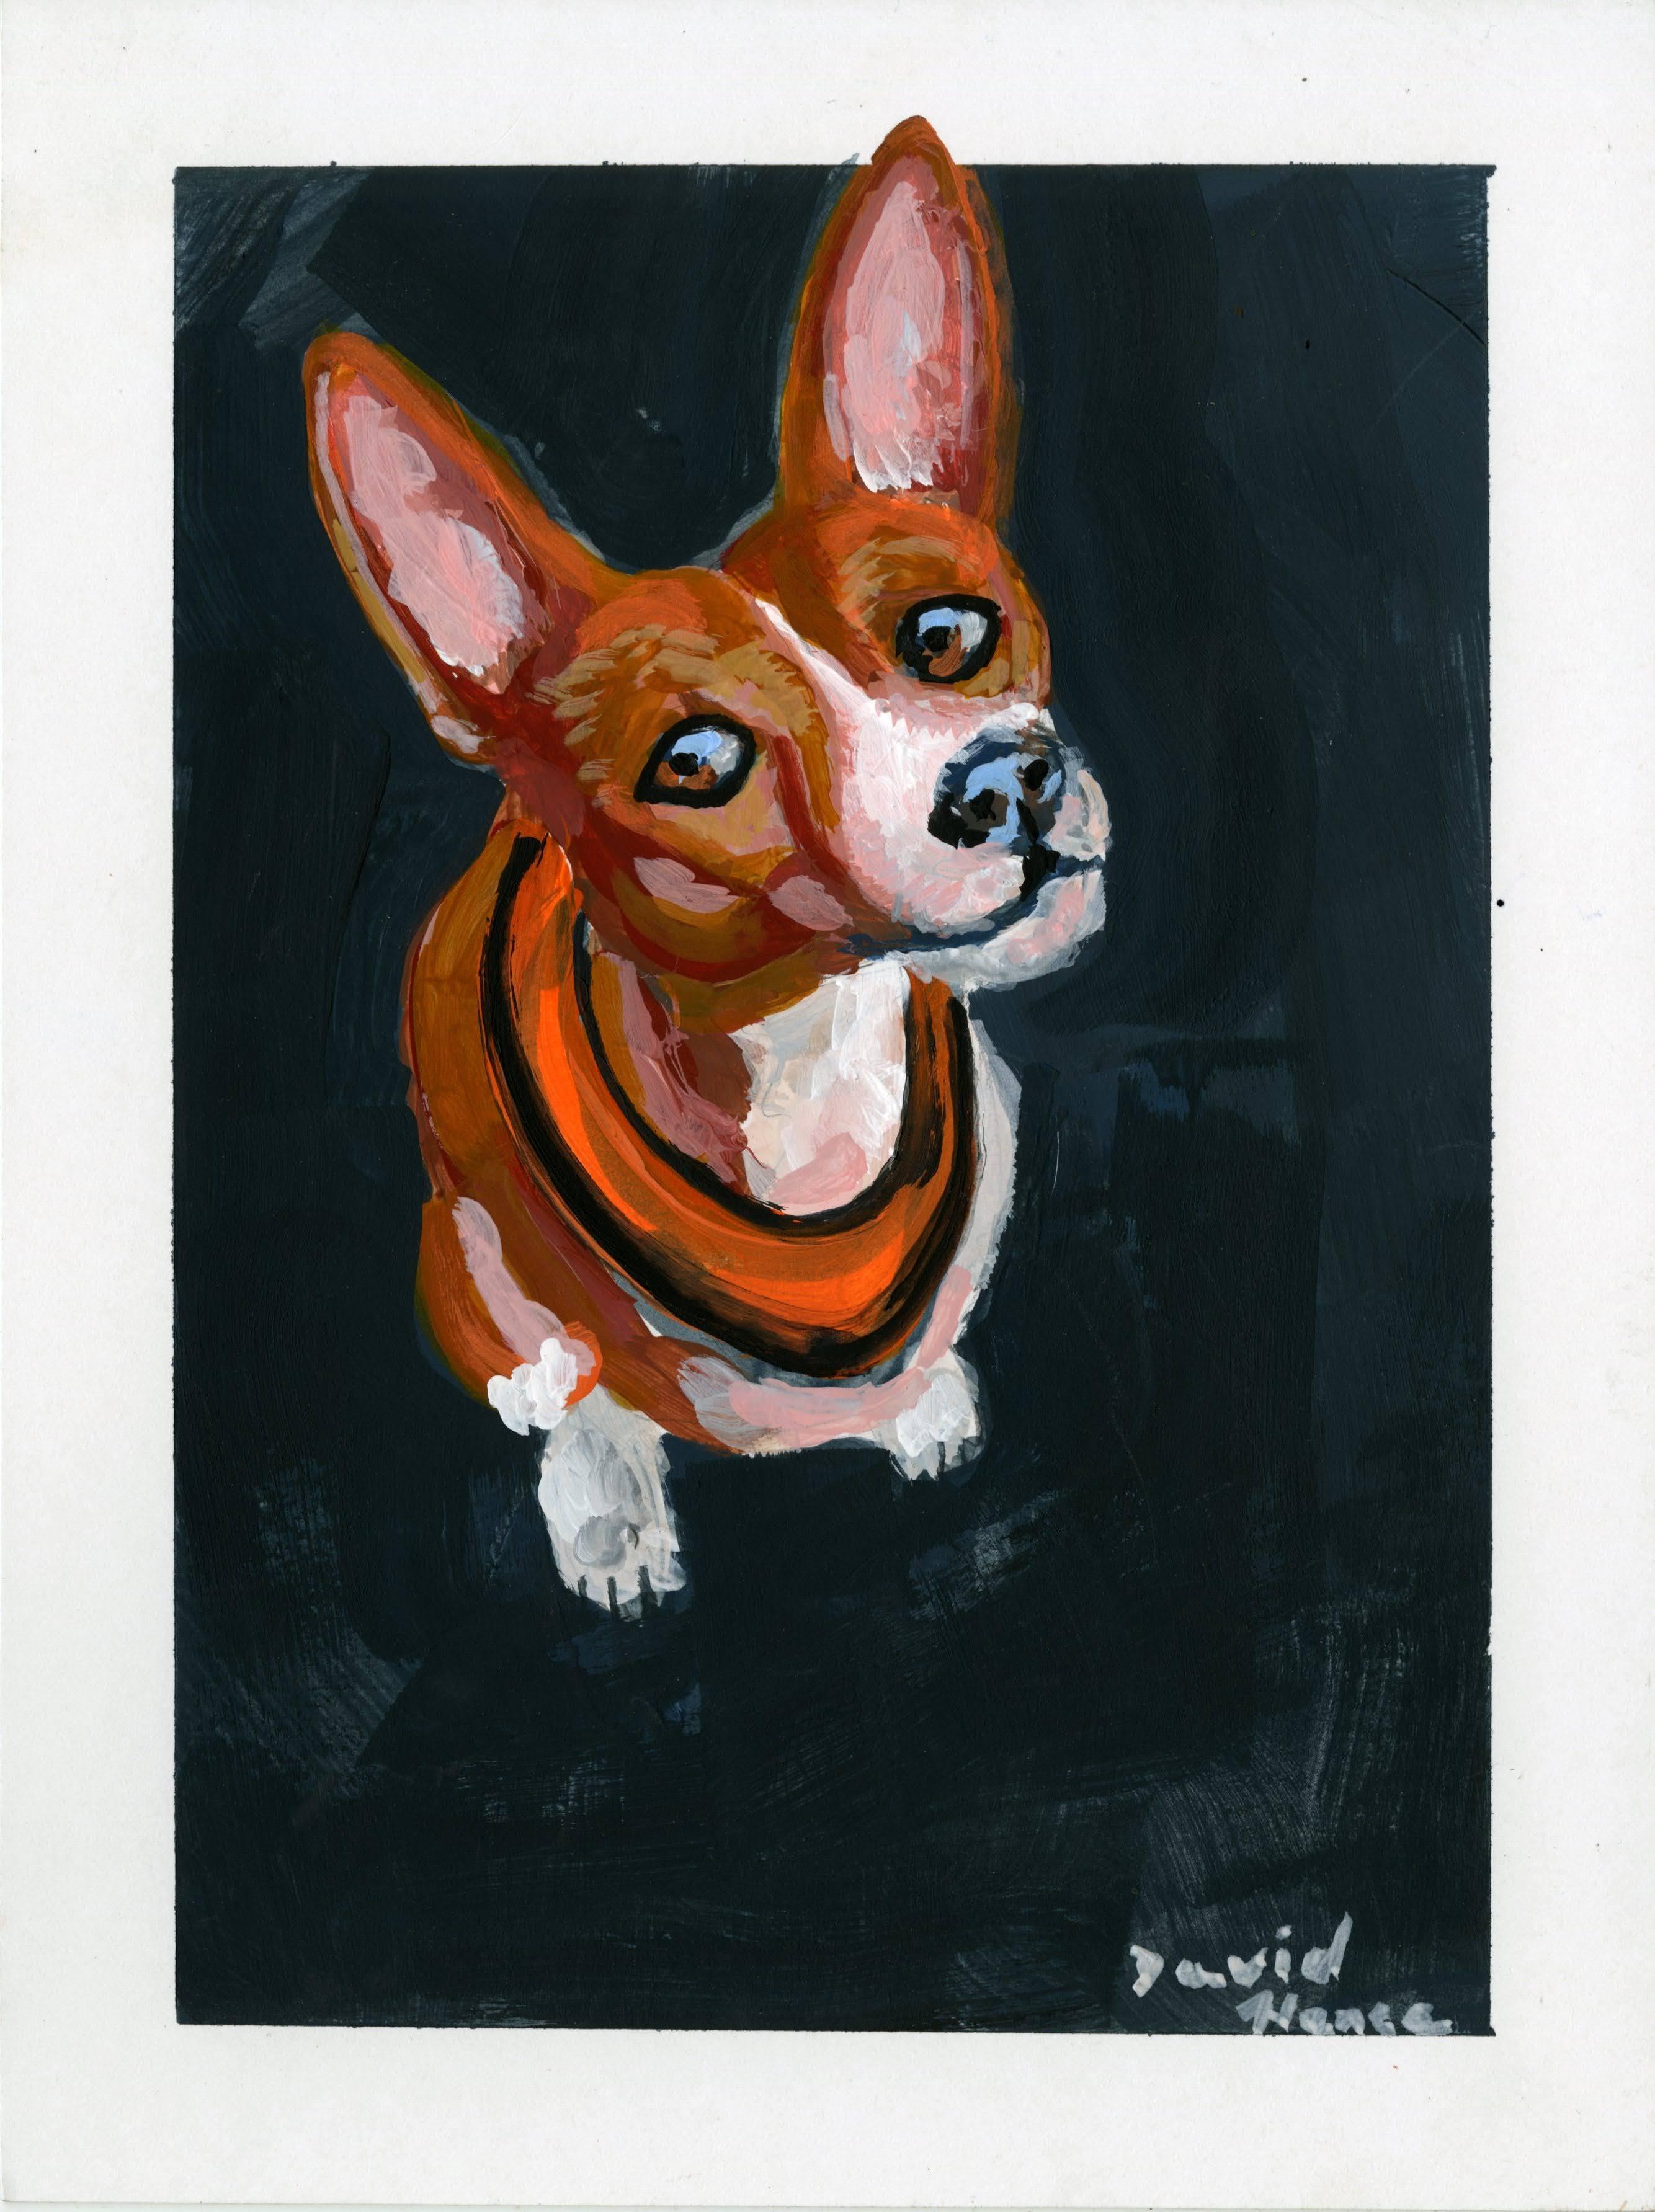 """Little Dog"" by David Hence"